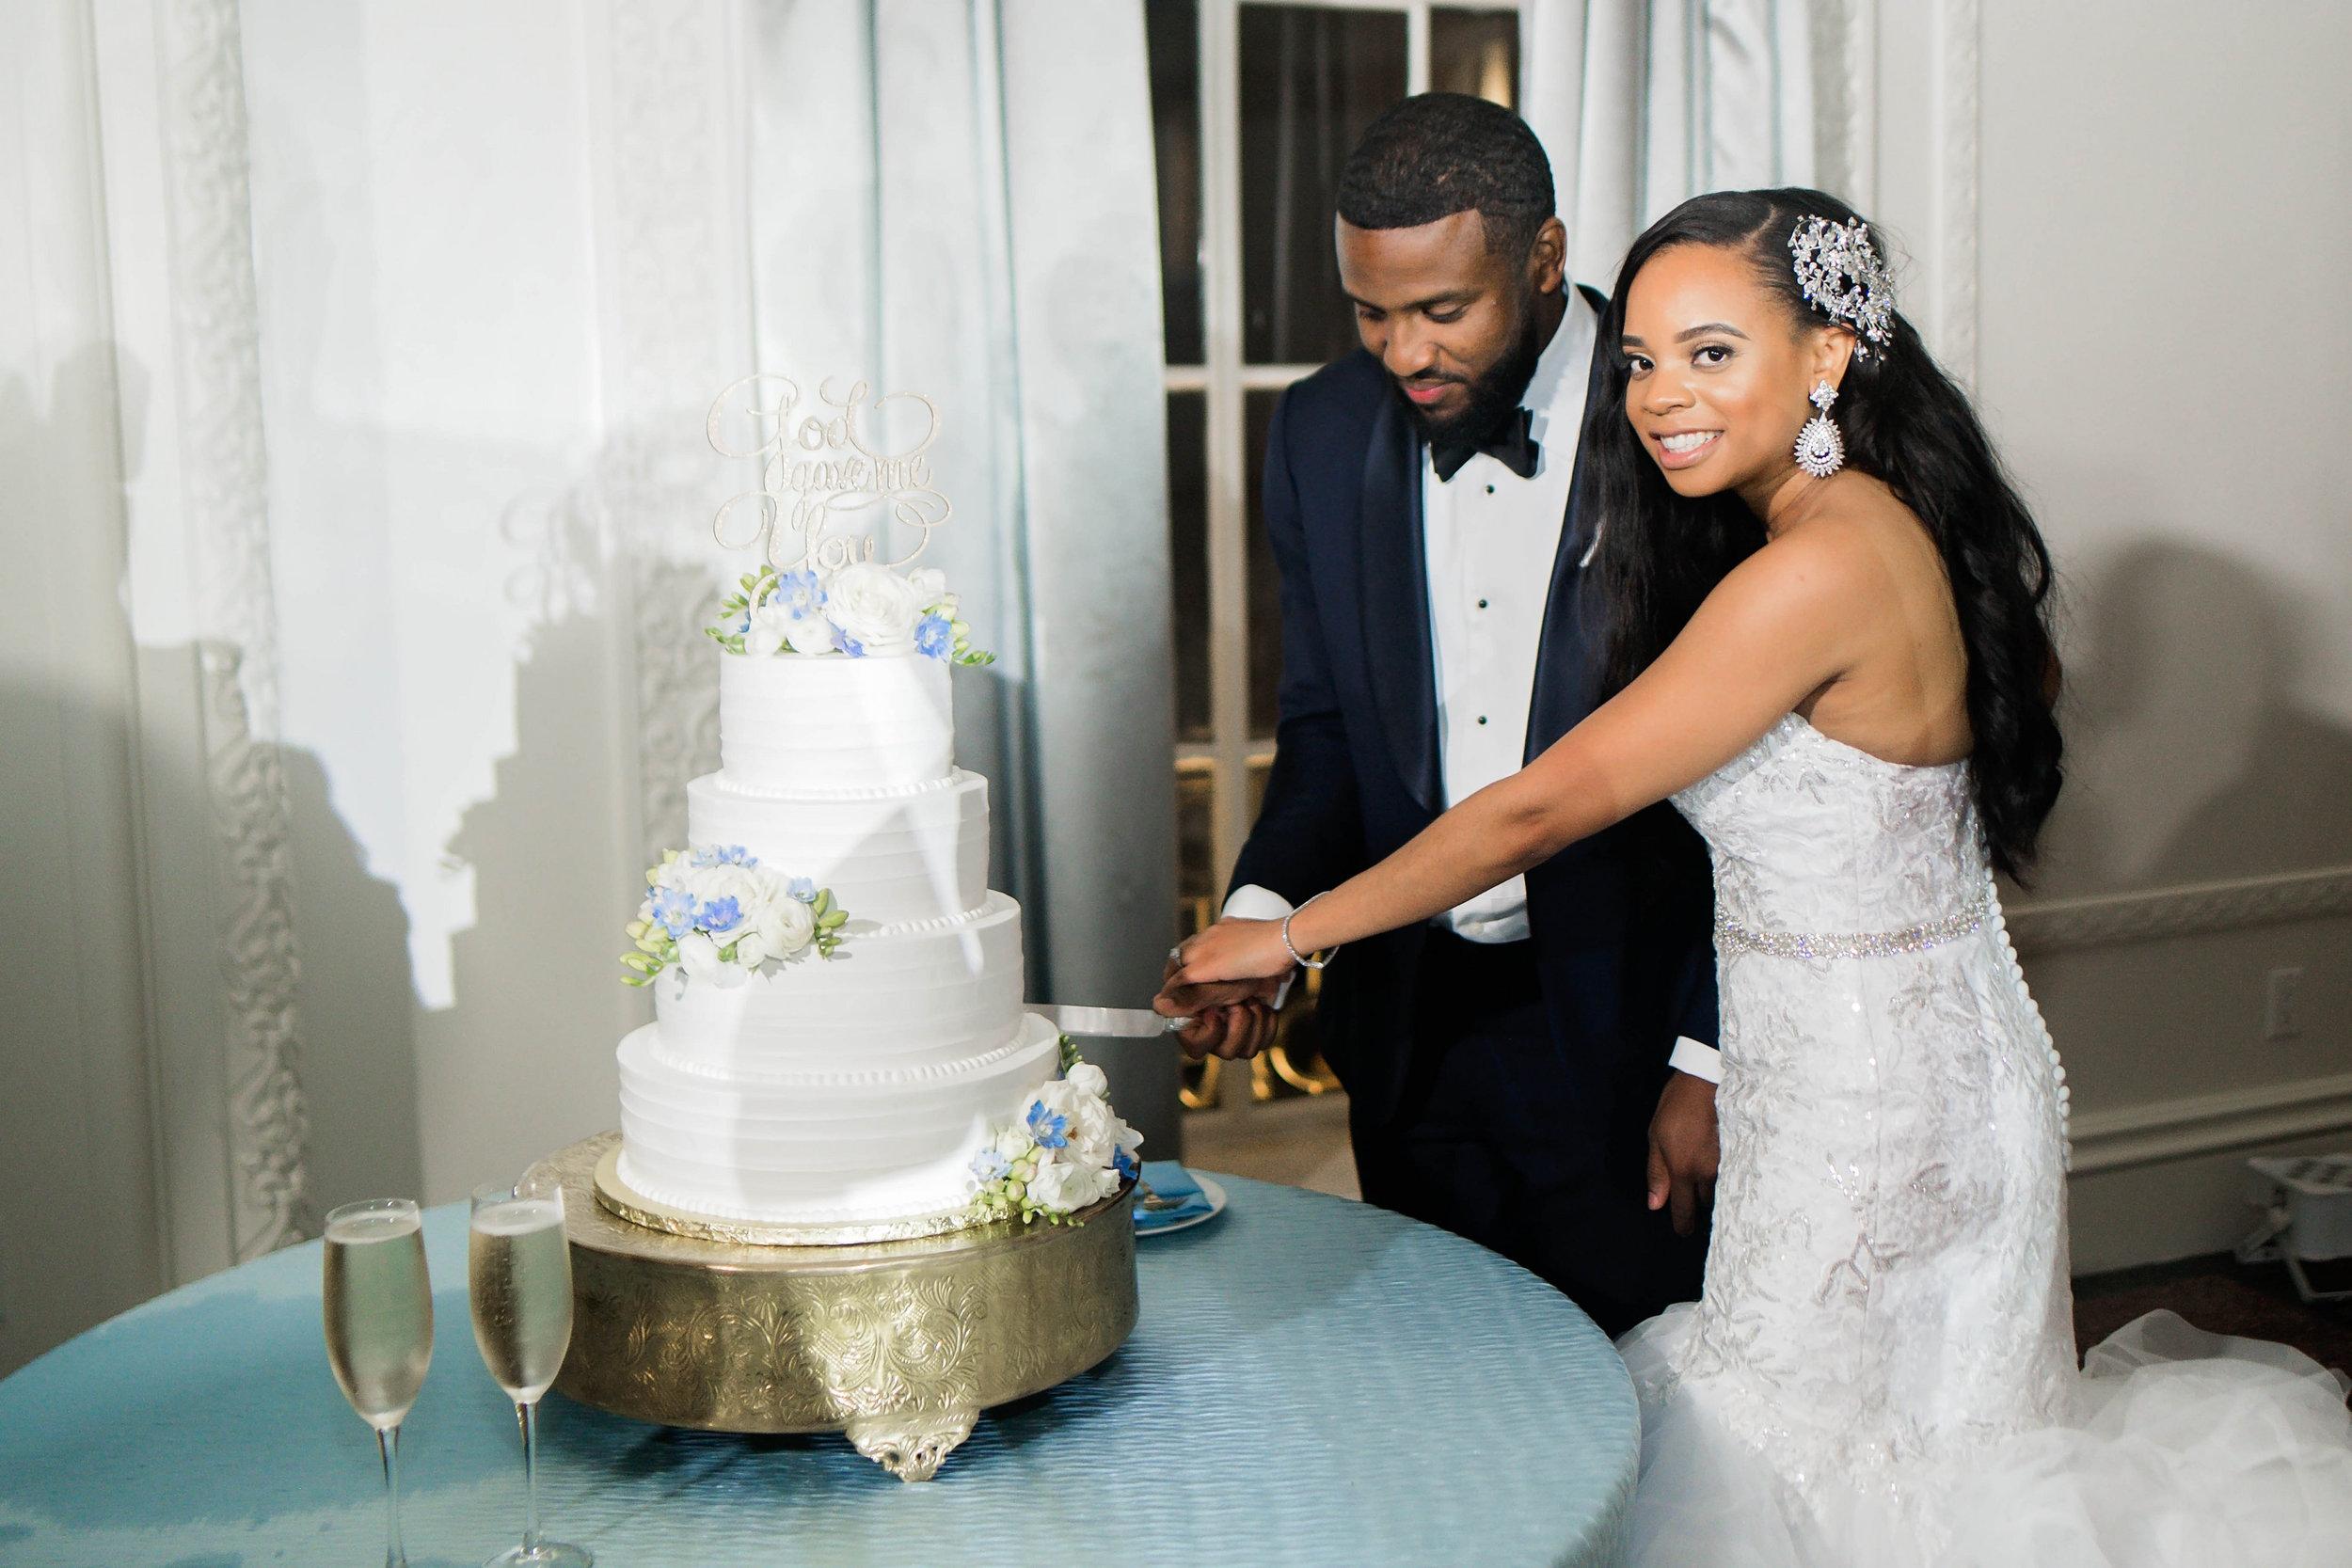 Tulsa Wedding- Pharris Photography- Reception- Darla + Quinton- Cake Tasting